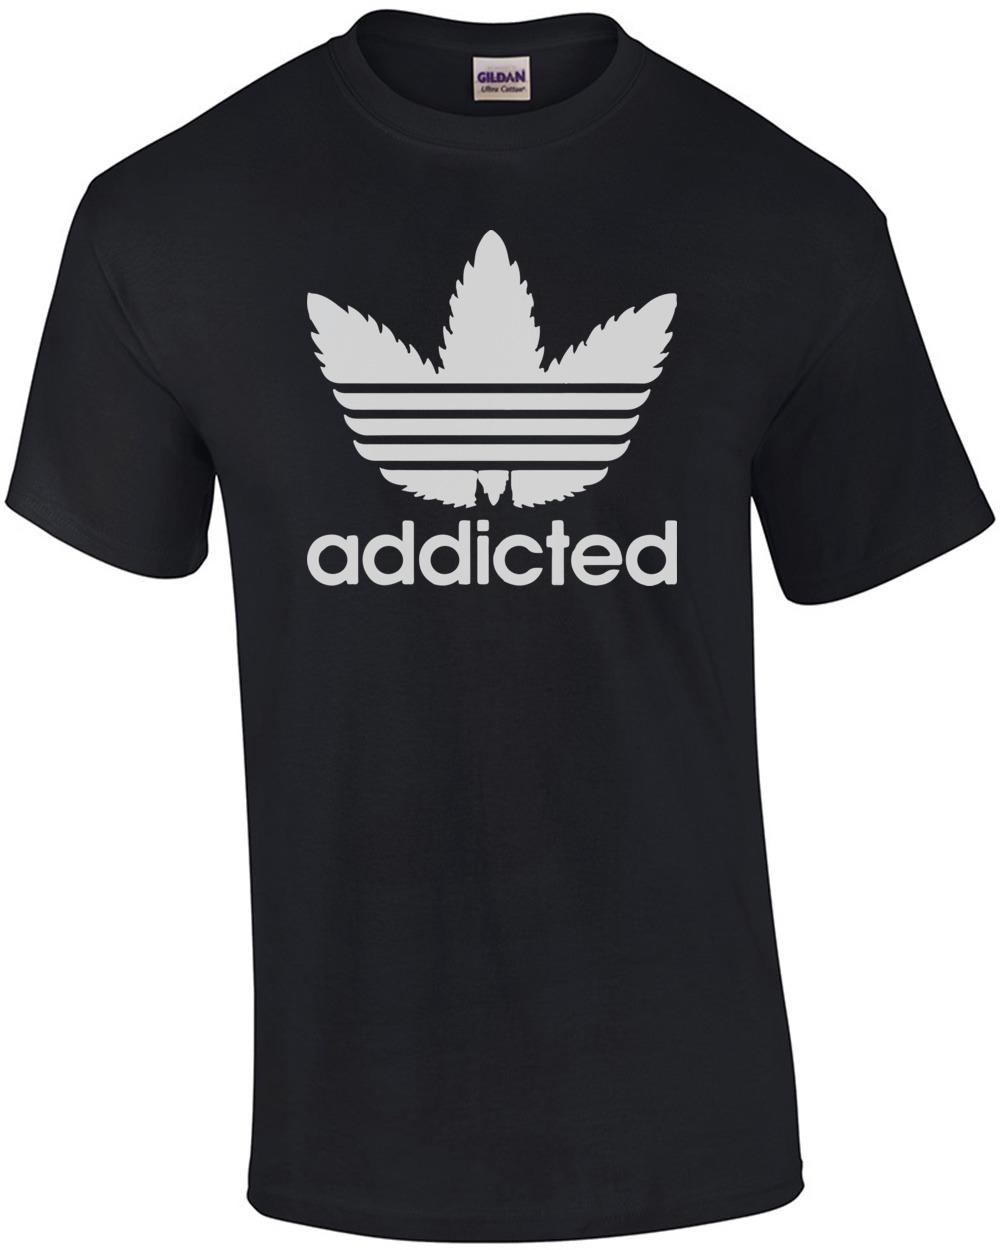 db3cbc2bb6 addicted--adidas-parody-tshirt-mens-regular-black_1.jpg